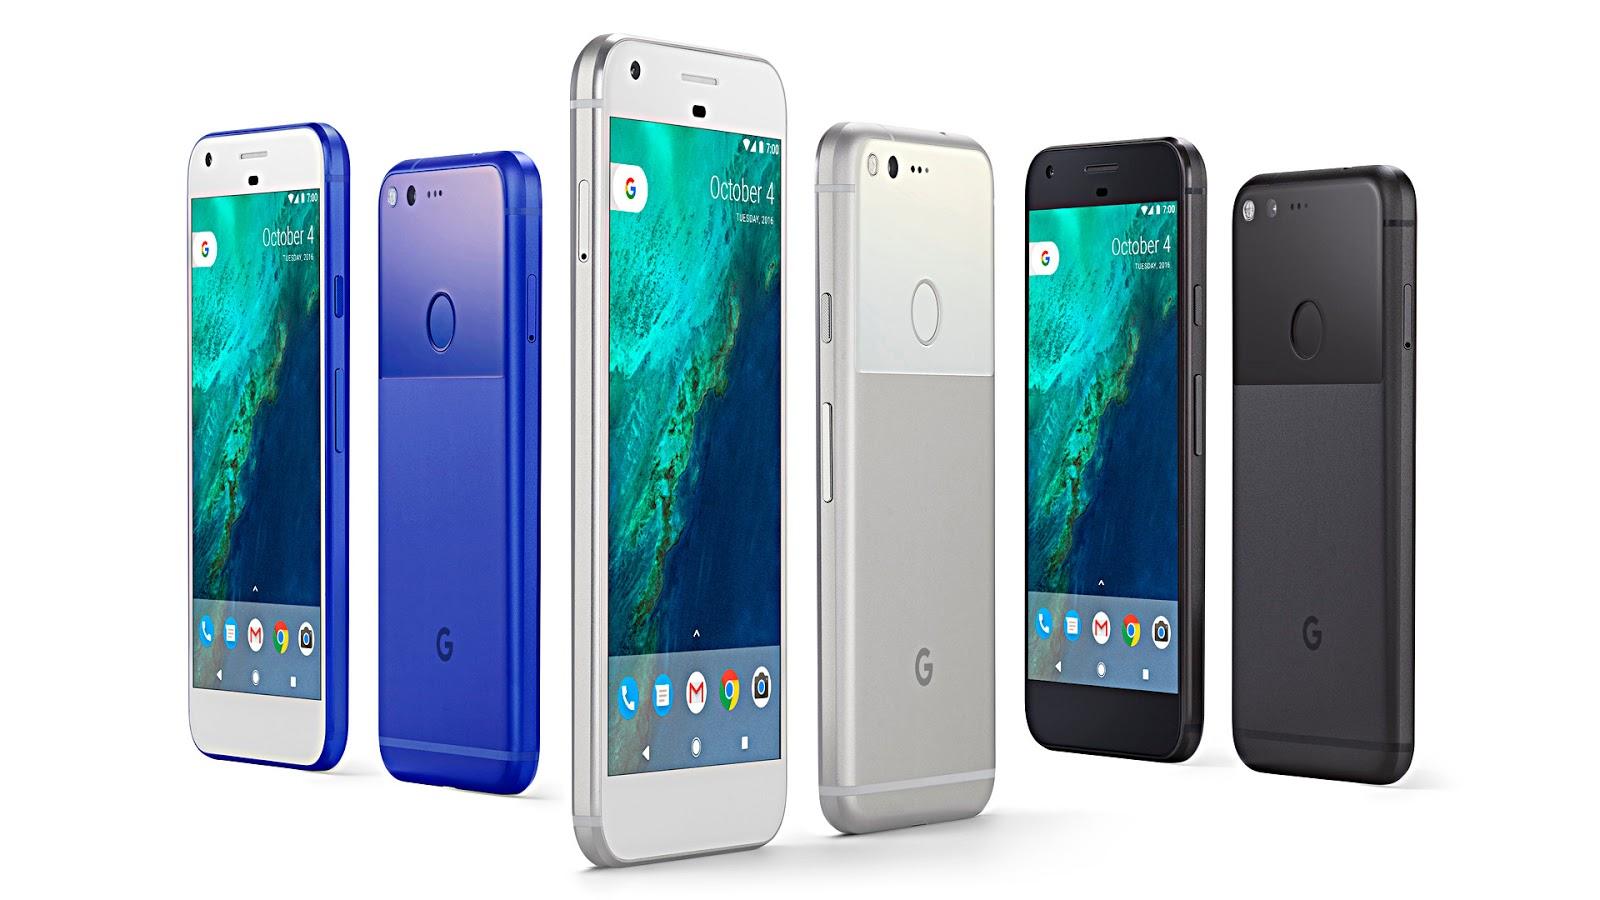 4G Lte Phones Under 7000